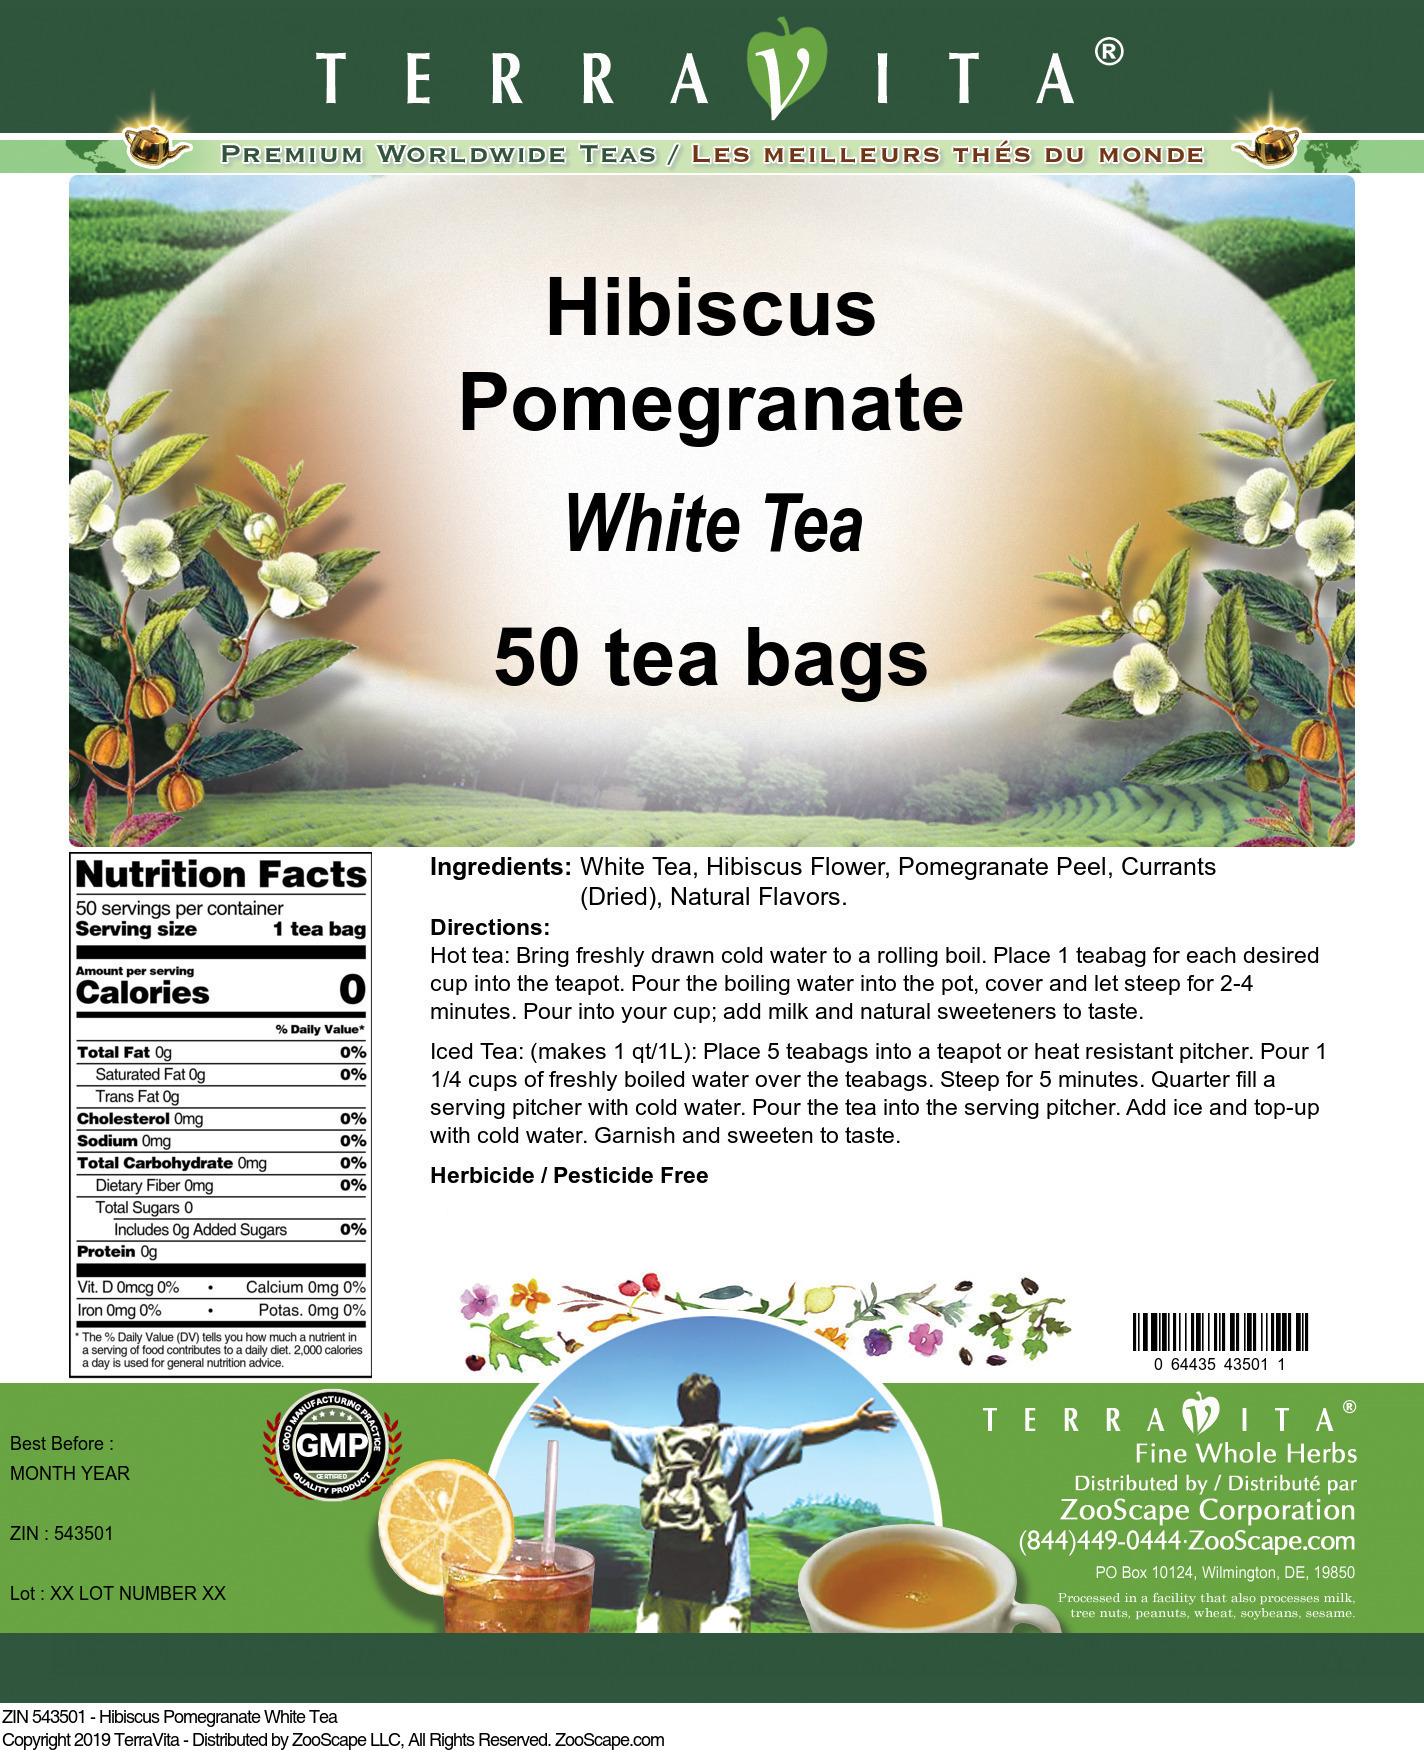 Hibiscus Pomegranate White Tea